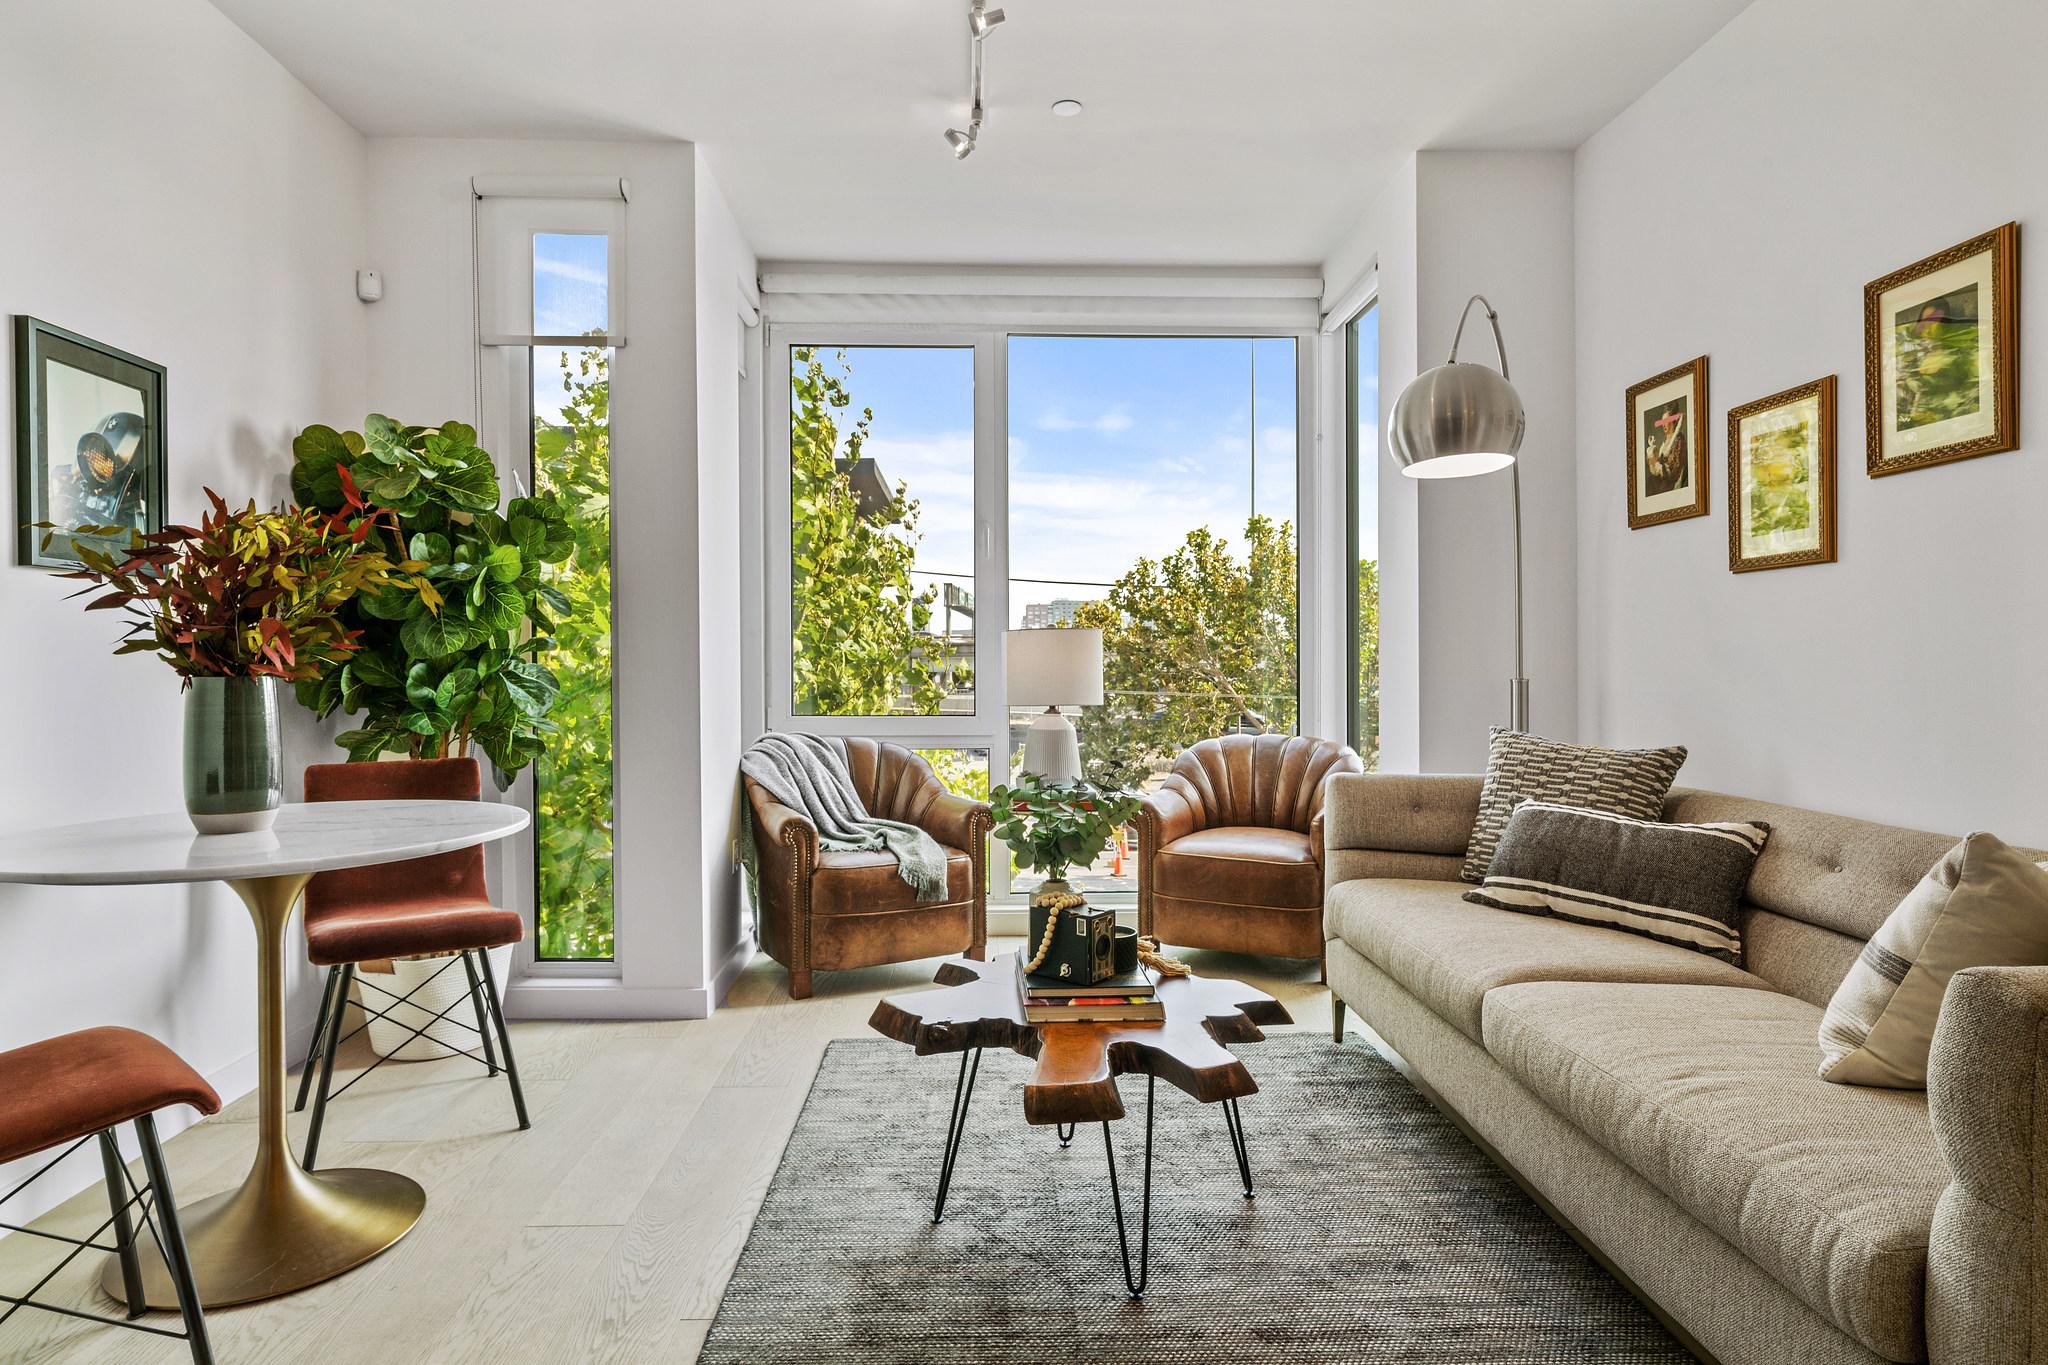 San Francisco Real Estate - Luxury Homes